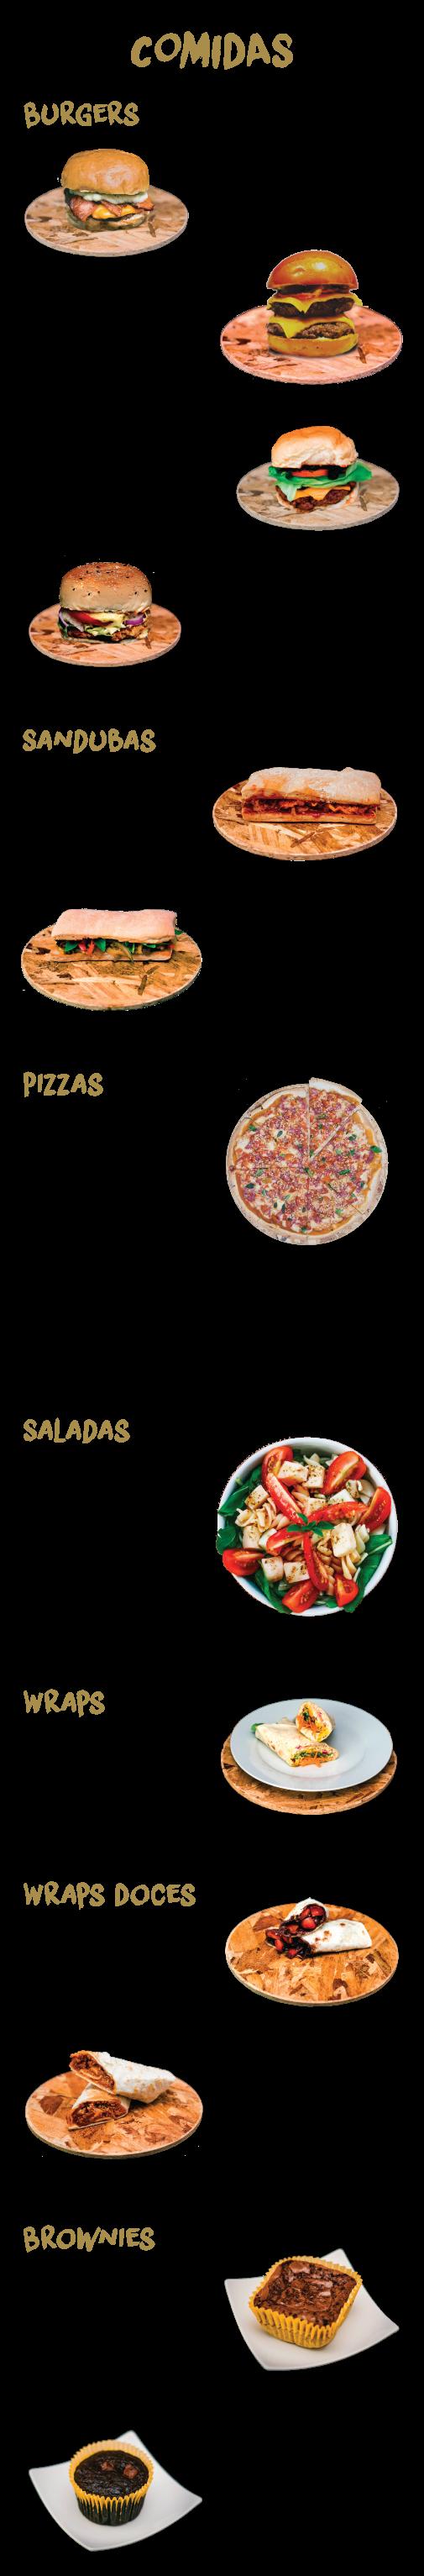 menu-site-comidas2.0.png